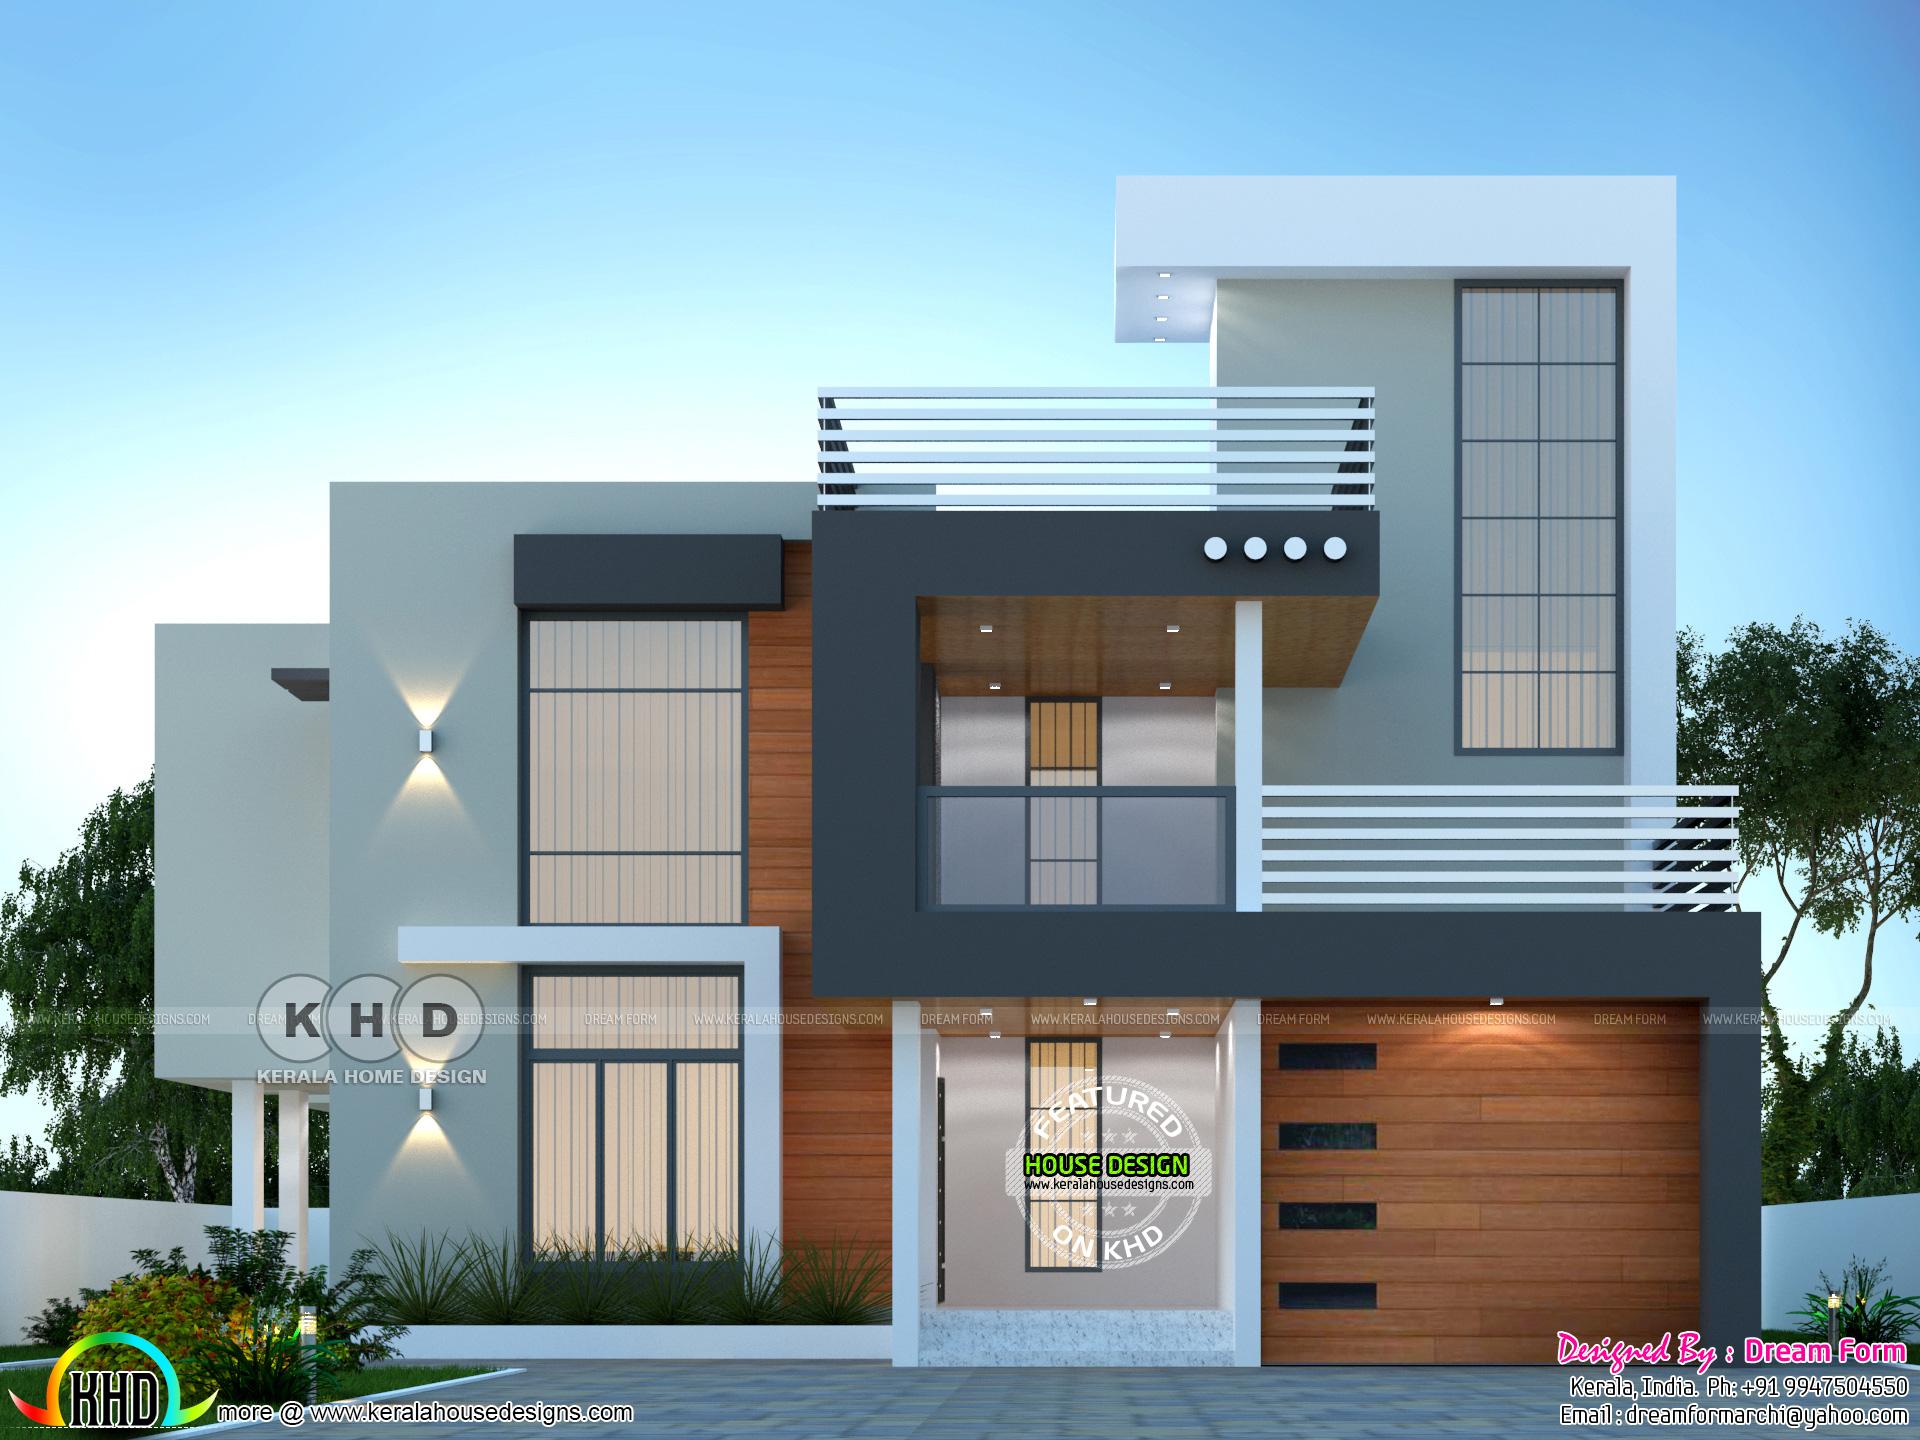 6 Bedrooms 4350 Sq Ft Modern Home Design Kerala Home Design And Floor Plans 8000 Houses